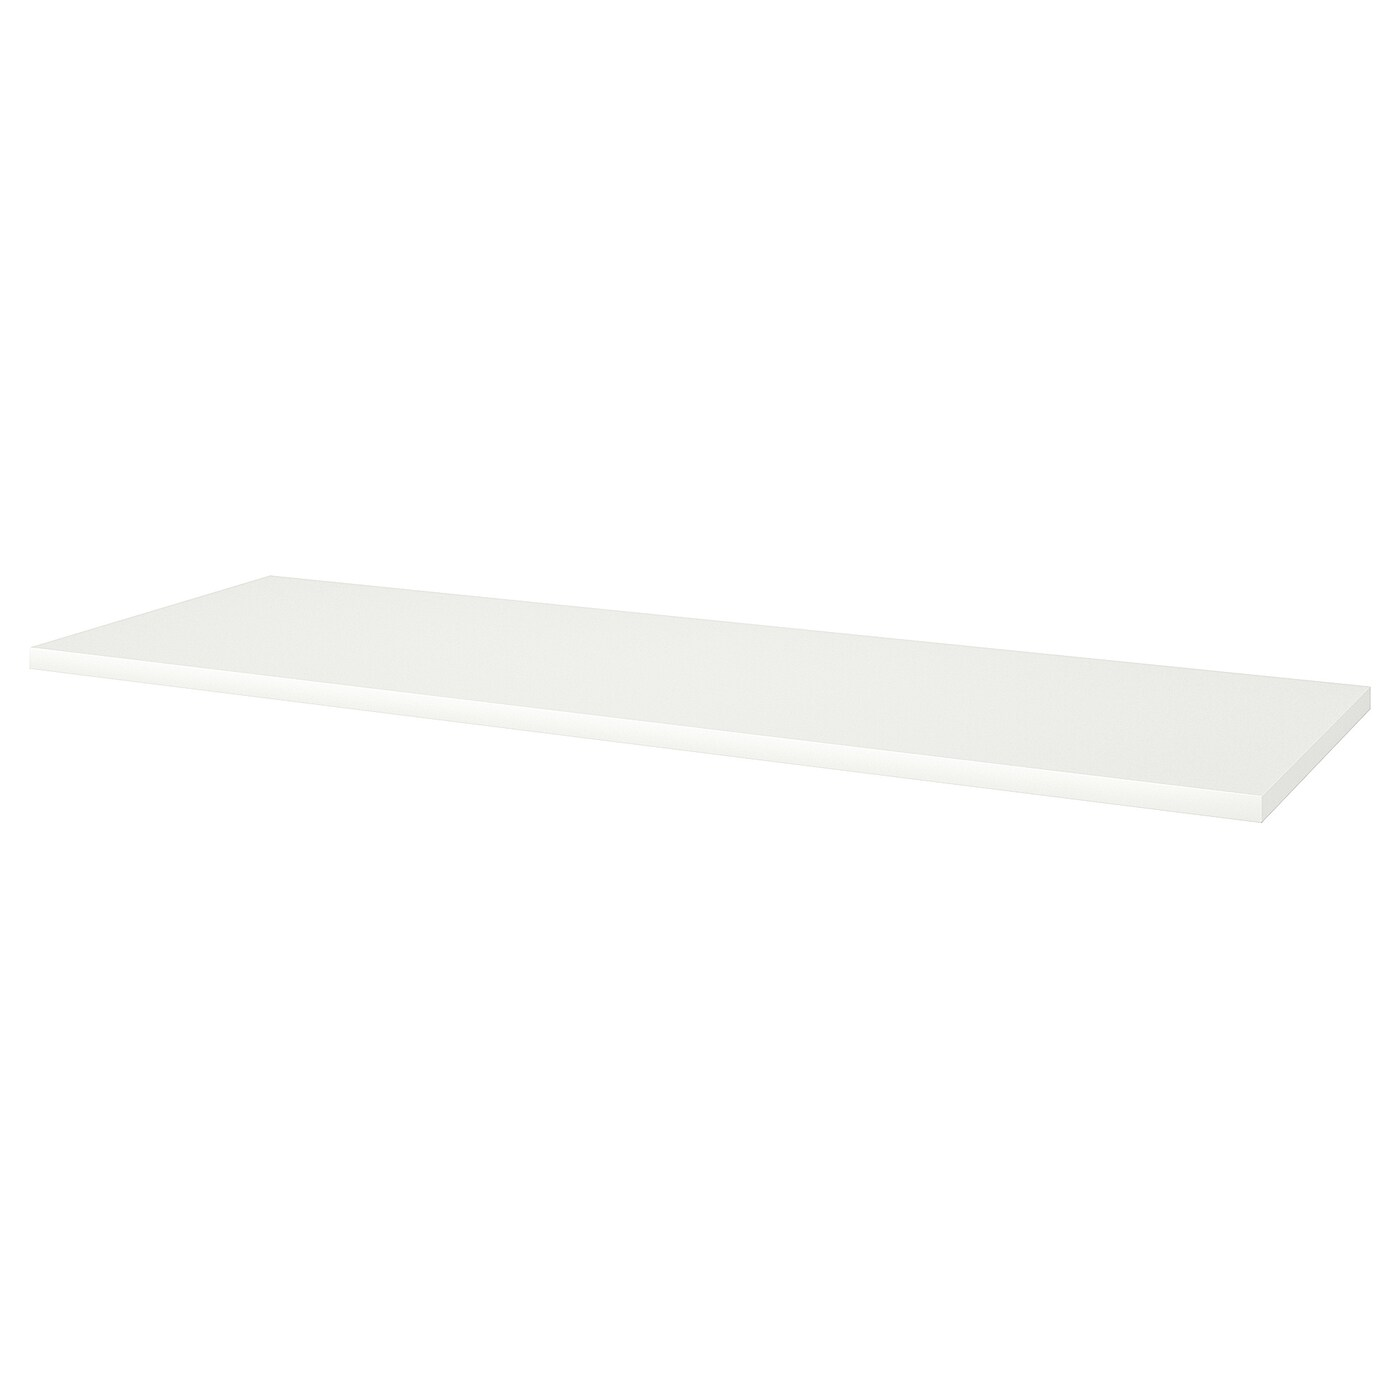 Linnmon Table Top White 200x60 Cm Ikea